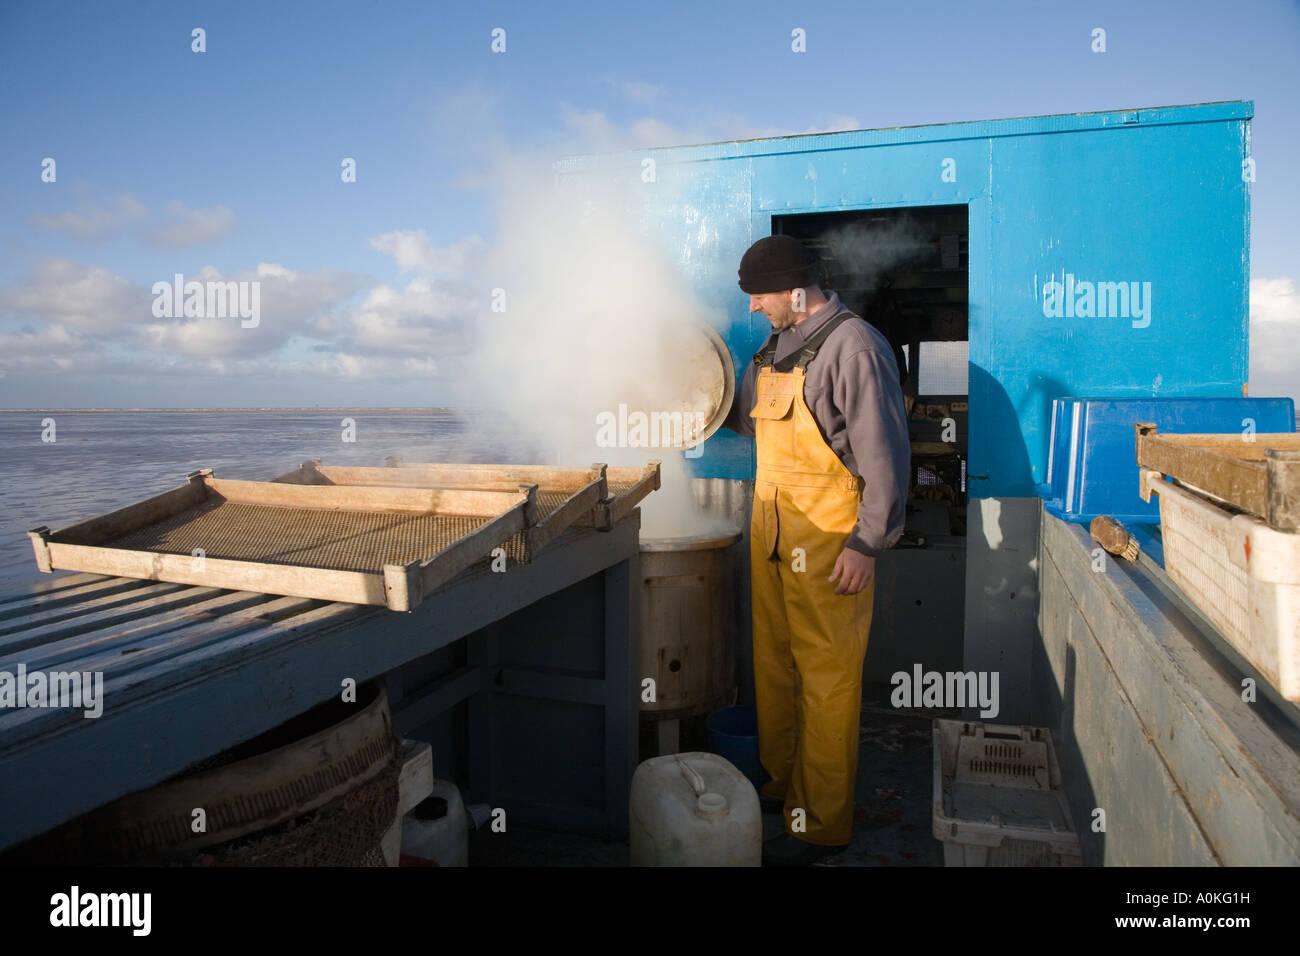 Kommerzielle Meeresfrüchte Muscheln Krabbenfischerei mit modifizierten Zugfahrzeug, Southport, Merseyside uk Stockbild